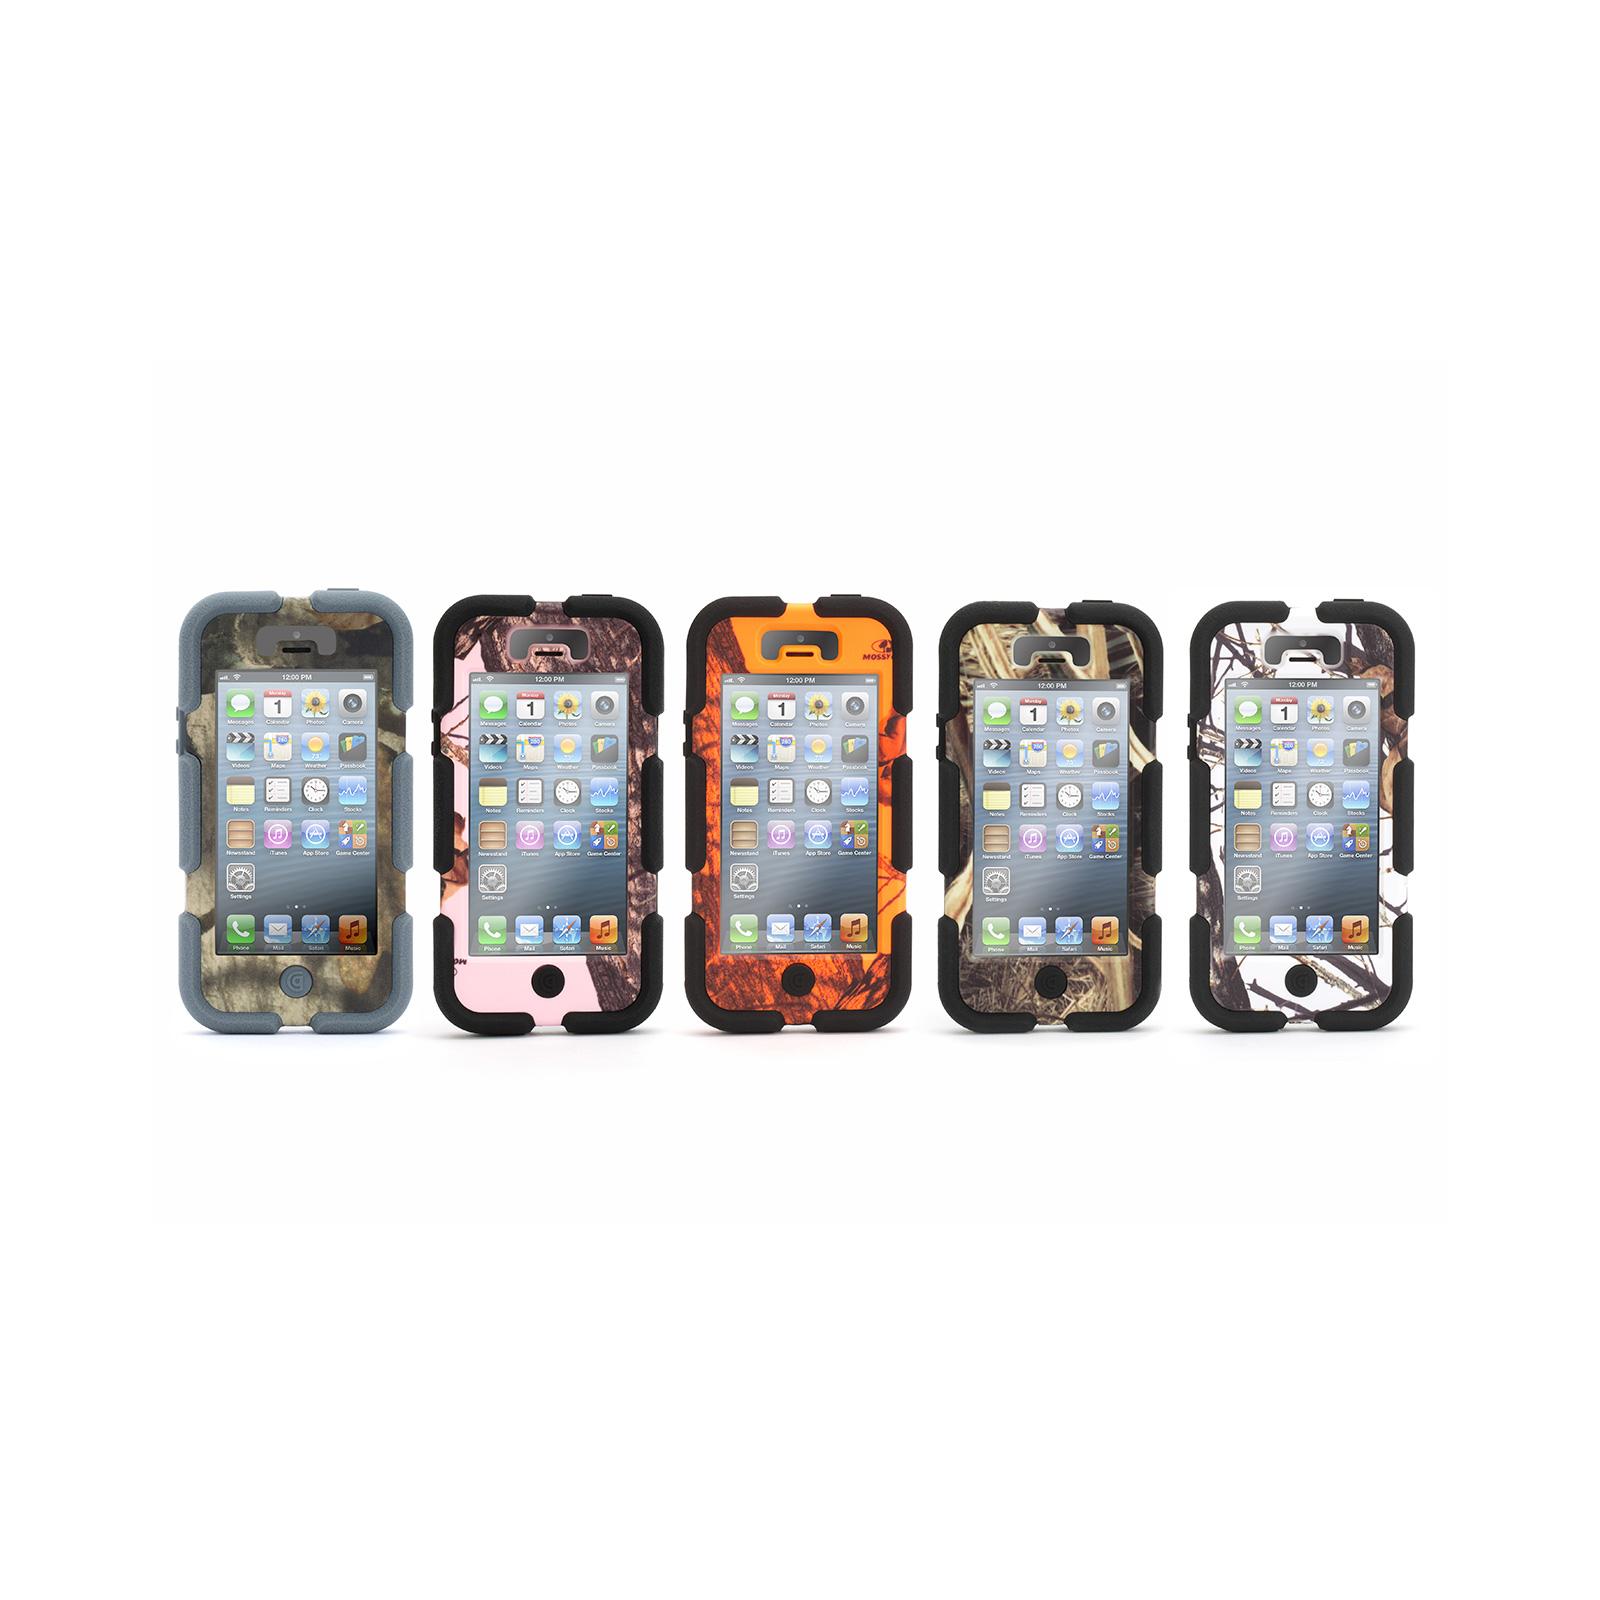 Griffin iPhone 5/5s, iPhone SE Rugged Case, Survivor All-Terrain Mossy Oak Camo, Heavy-Duty Case in Mossy Oak Camo-Direct From Griffin